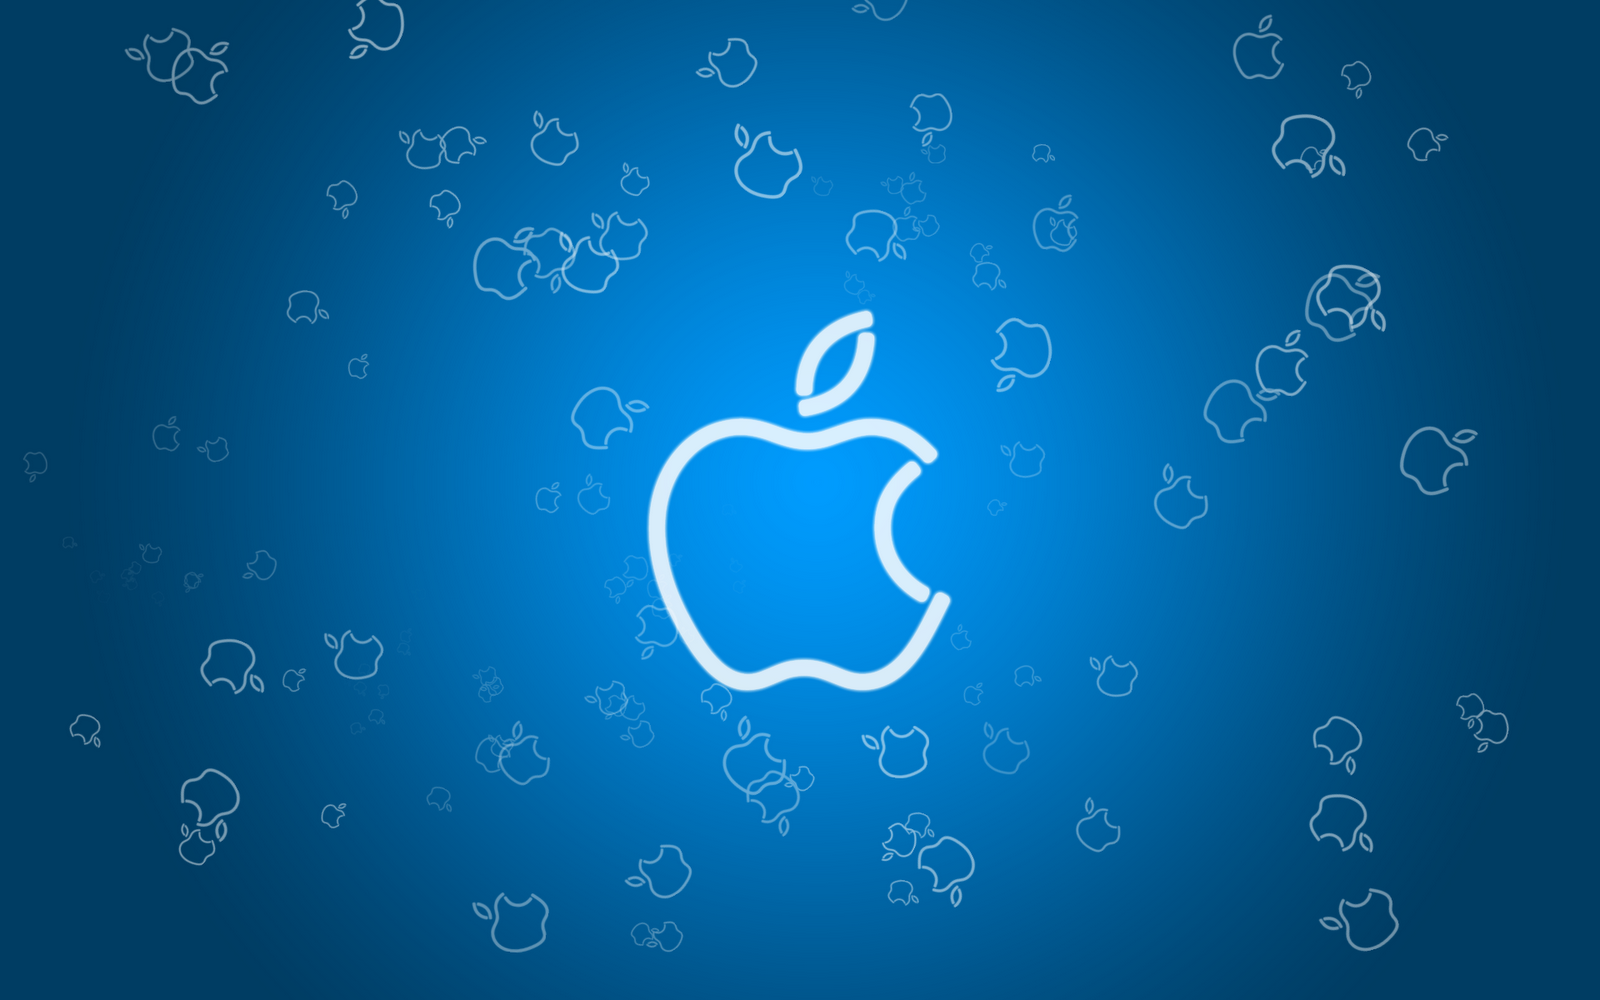 http://3.bp.blogspot.com/-LCC7tpFgkMQ/TuudHv1sfxI/AAAAAAAACy4/p1J0GXNM6Gg/s1600/Apple_flakes_blue_hd_wallpaper.png